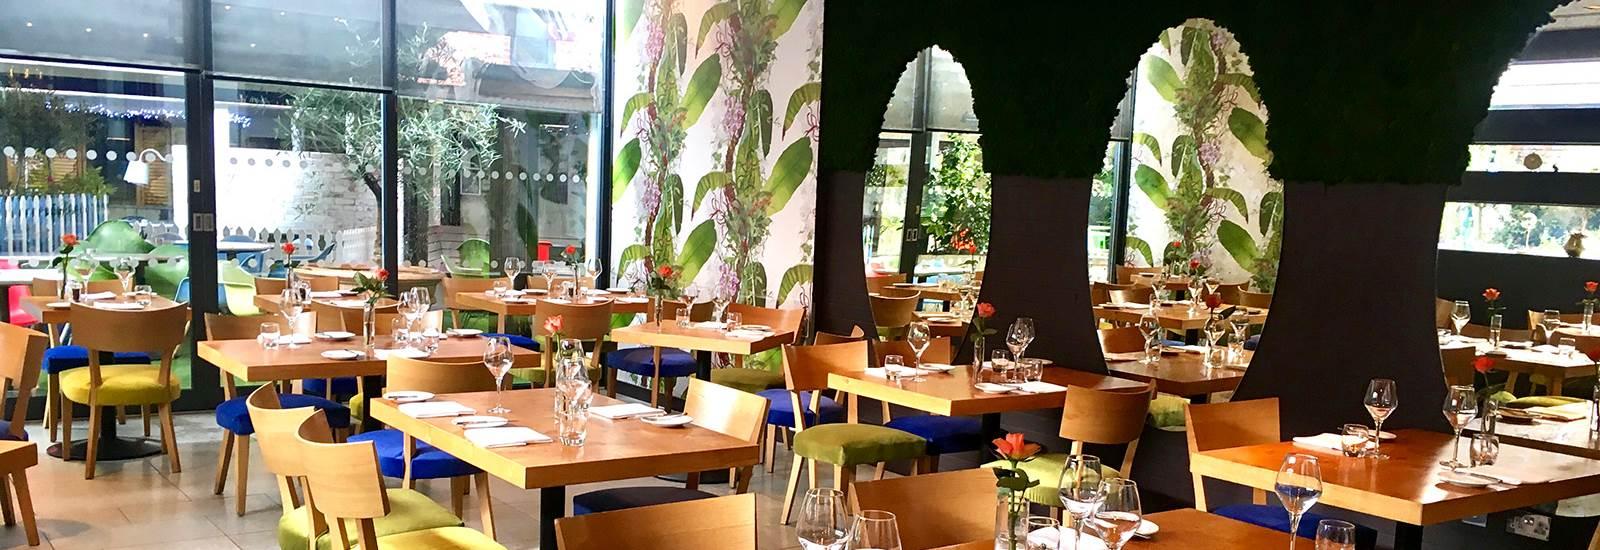 onionring restaurant guide for restaurants in manchester. Black Bedroom Furniture Sets. Home Design Ideas